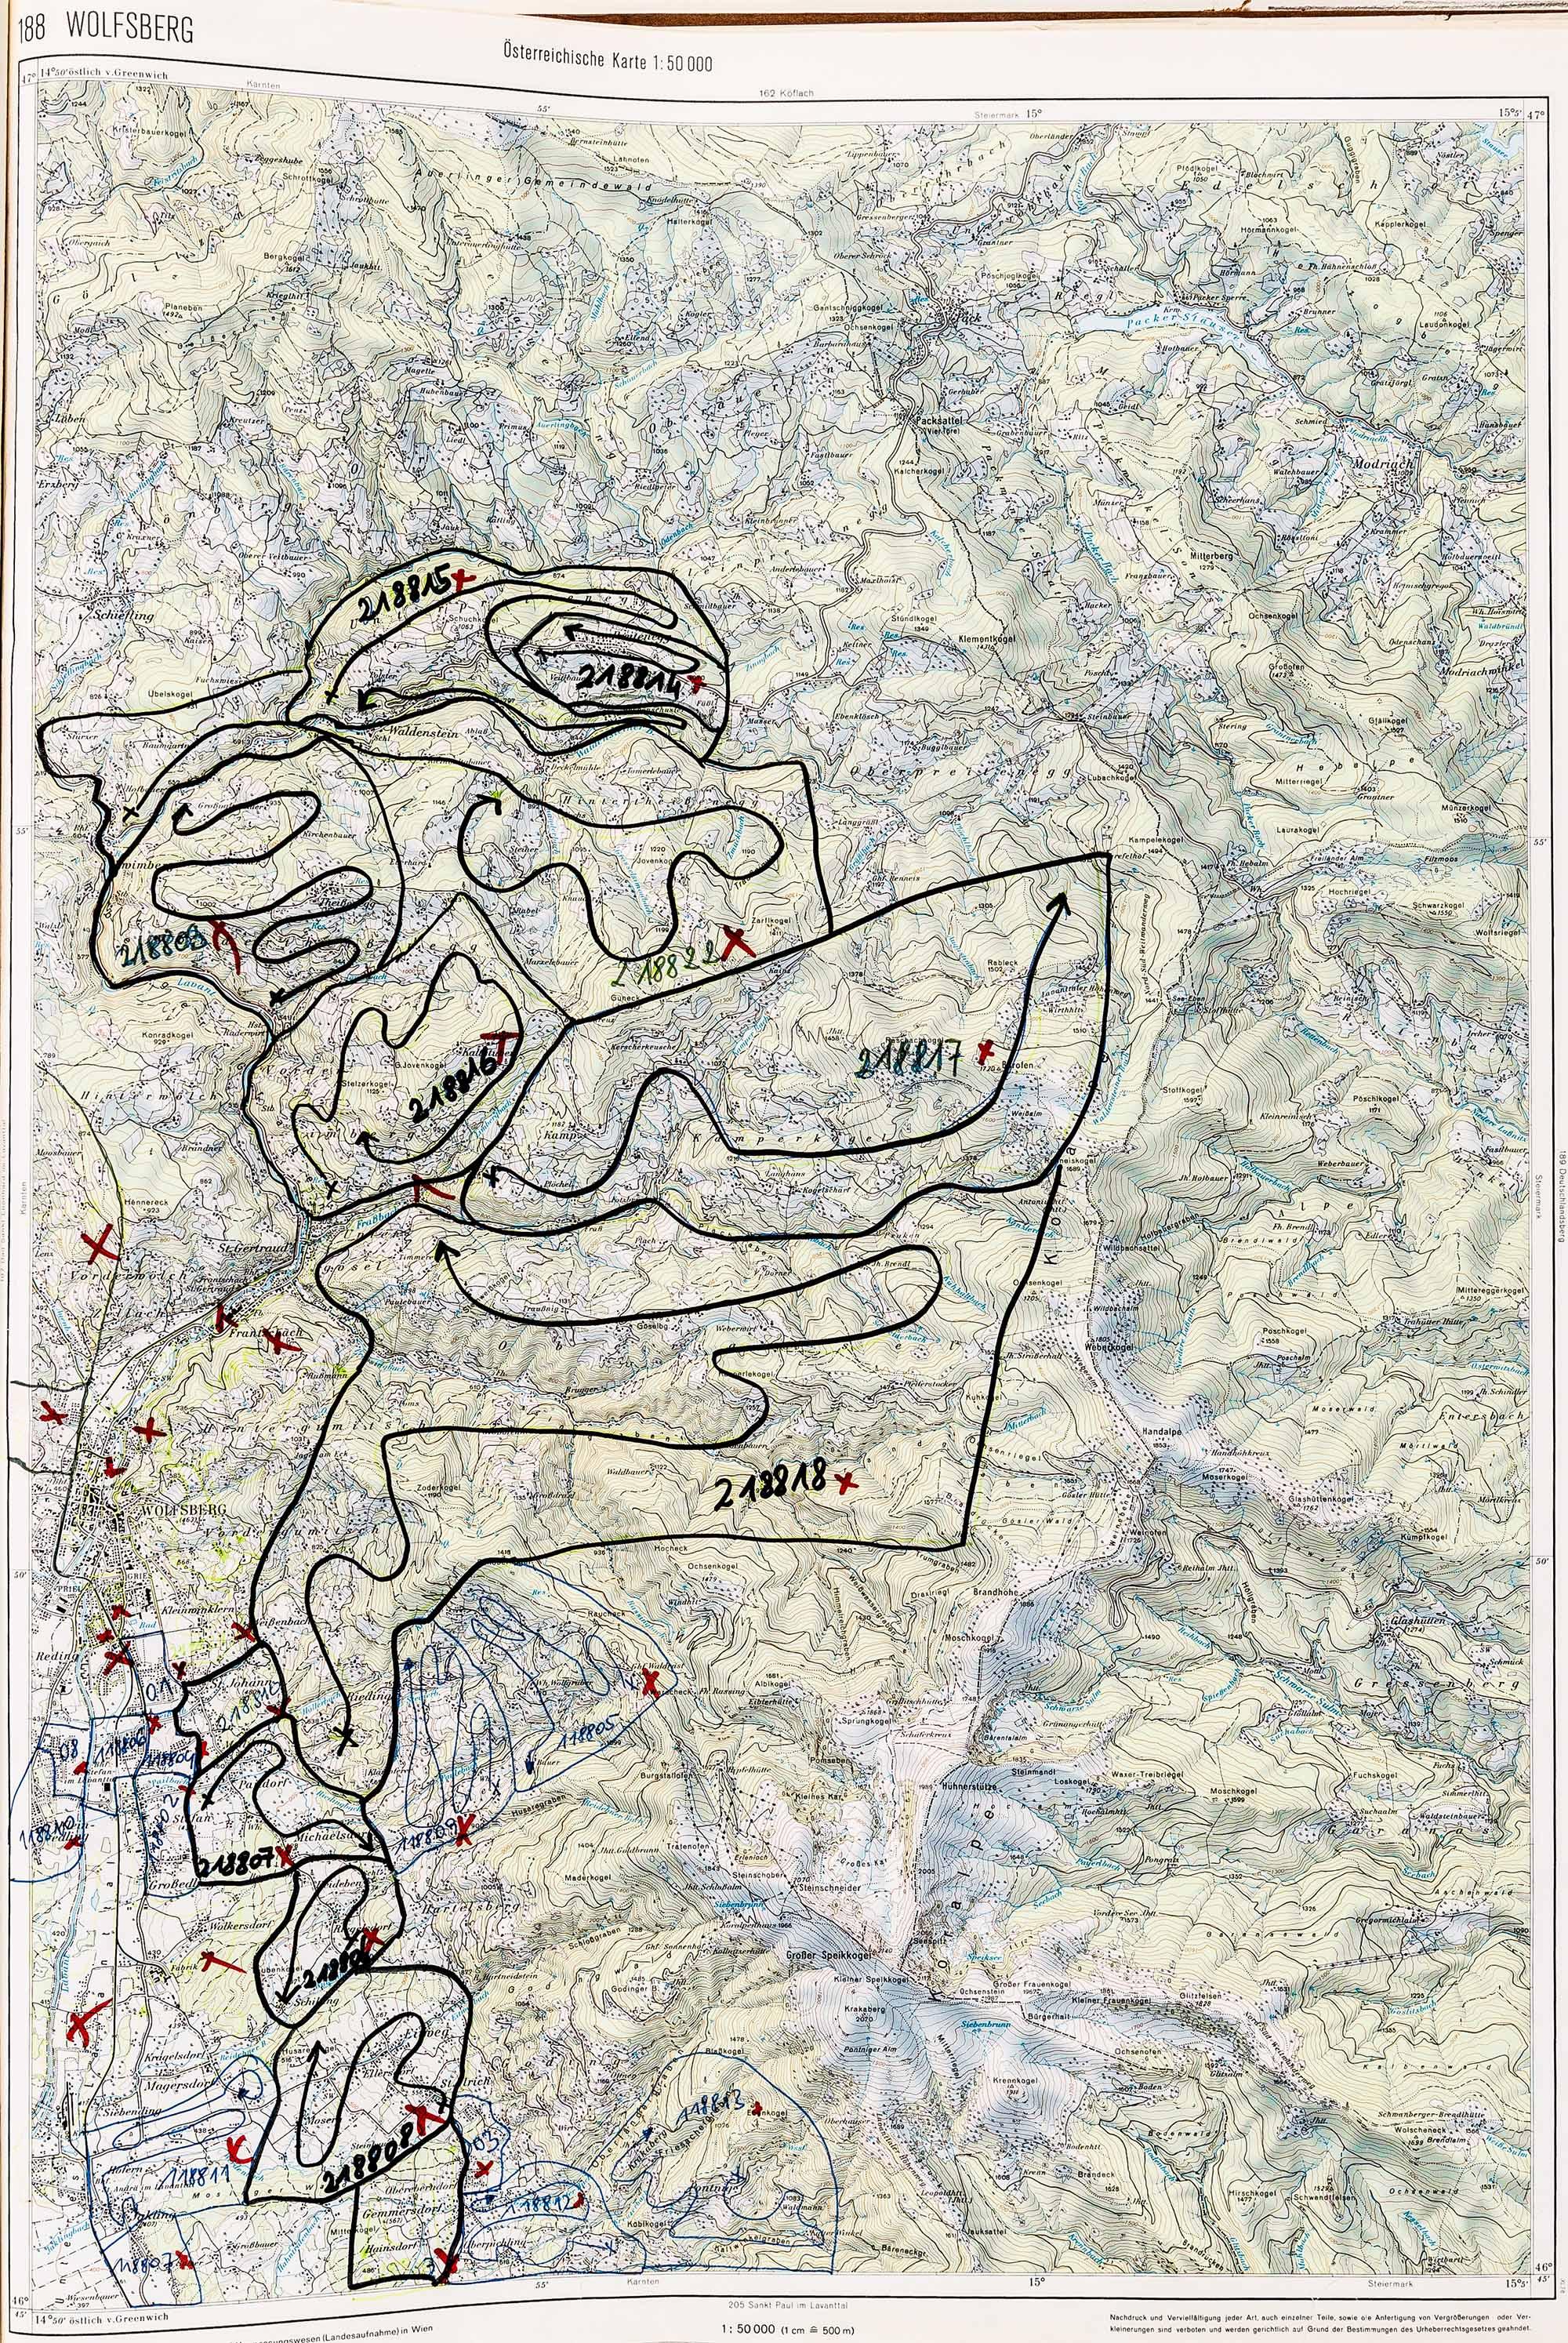 1979-1982 Karte 188